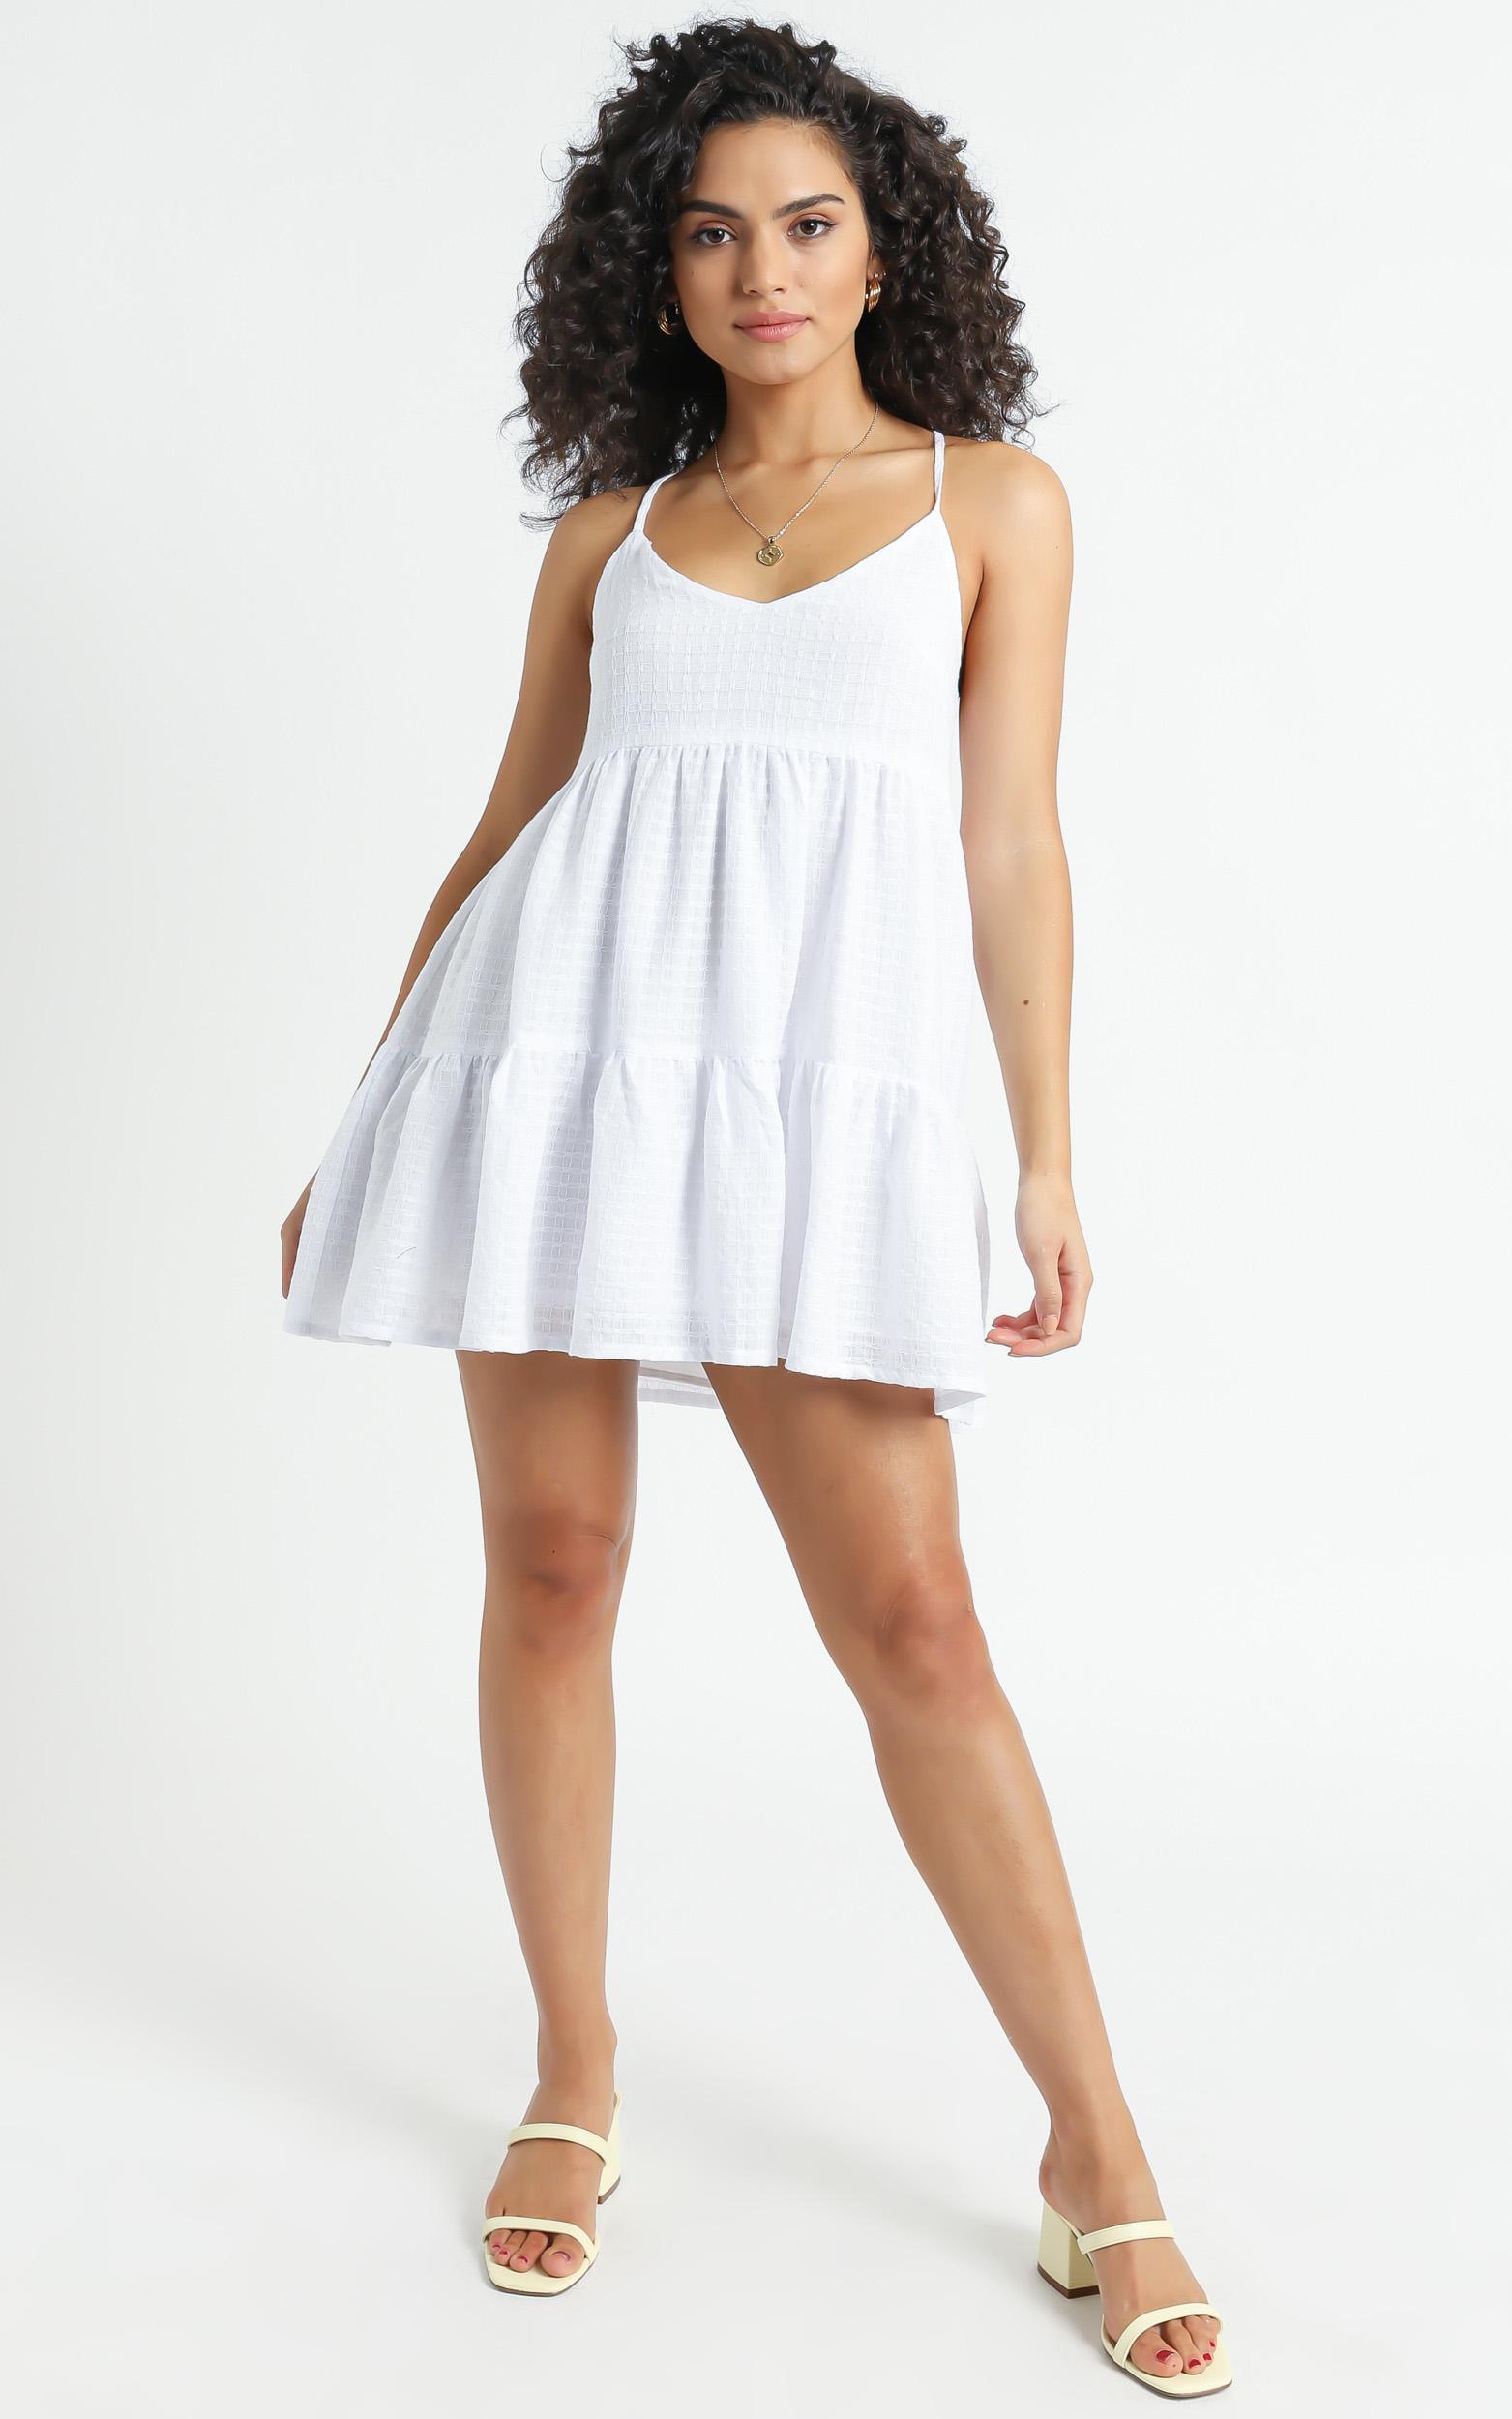 Salina Dress in White - 6 (XS), White, hi-res image number null